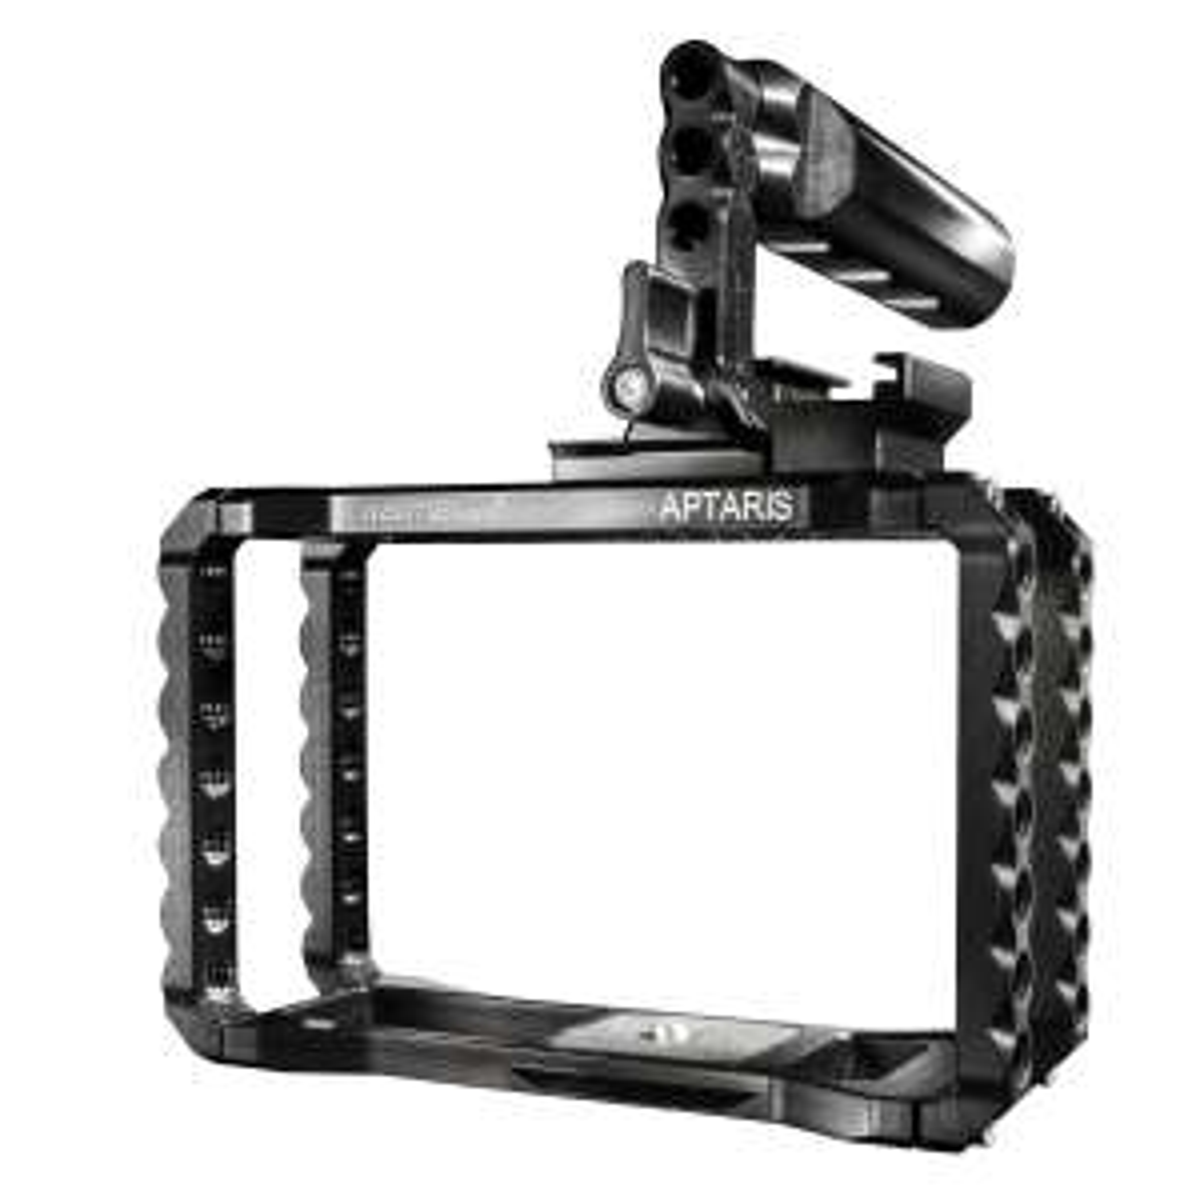 Walimex Pro Aptaris Cage-System für Nikon 1  /Idealo 228€